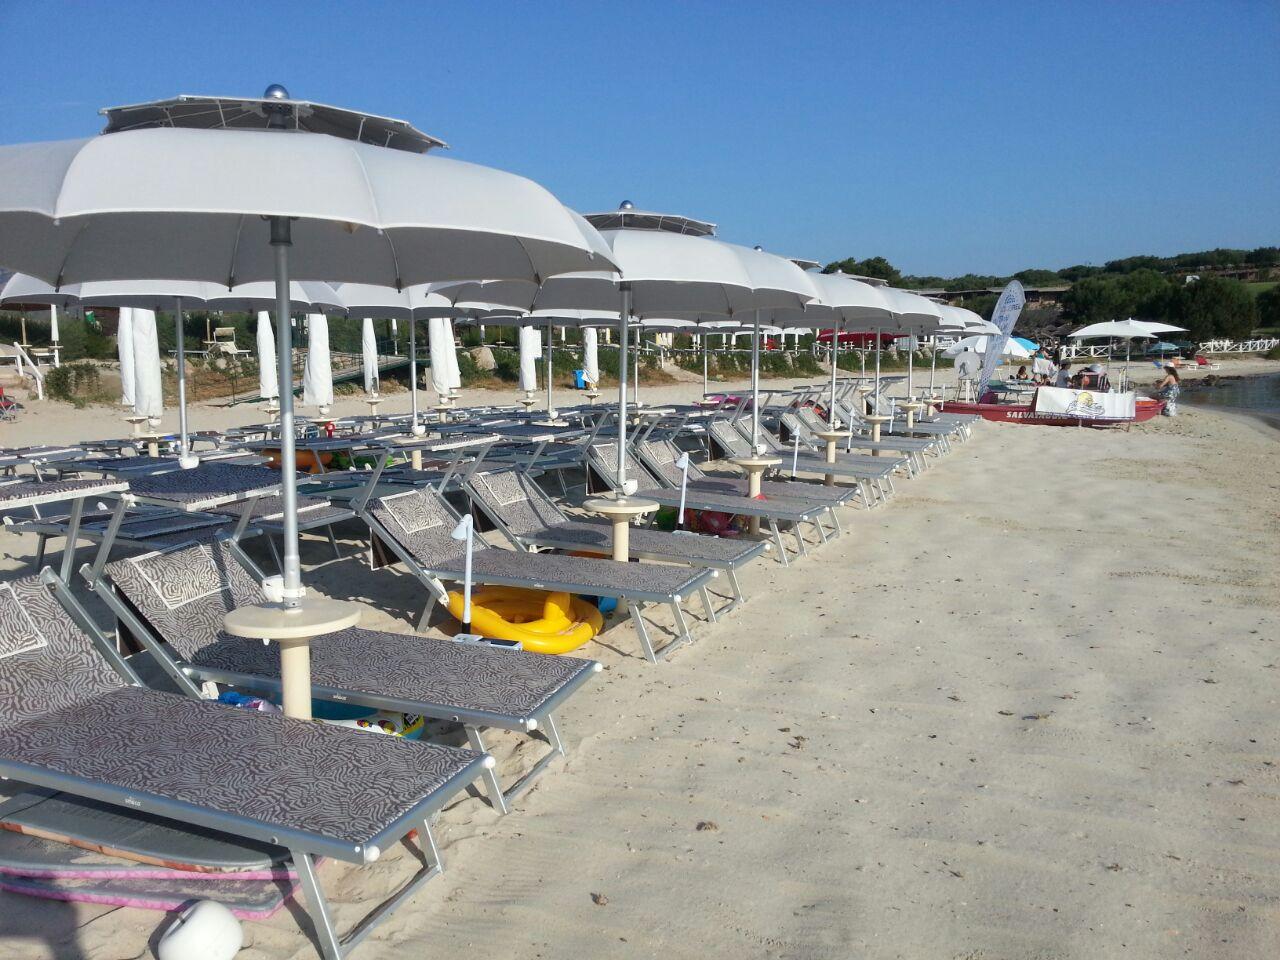 Spiaggia Ira alesummer